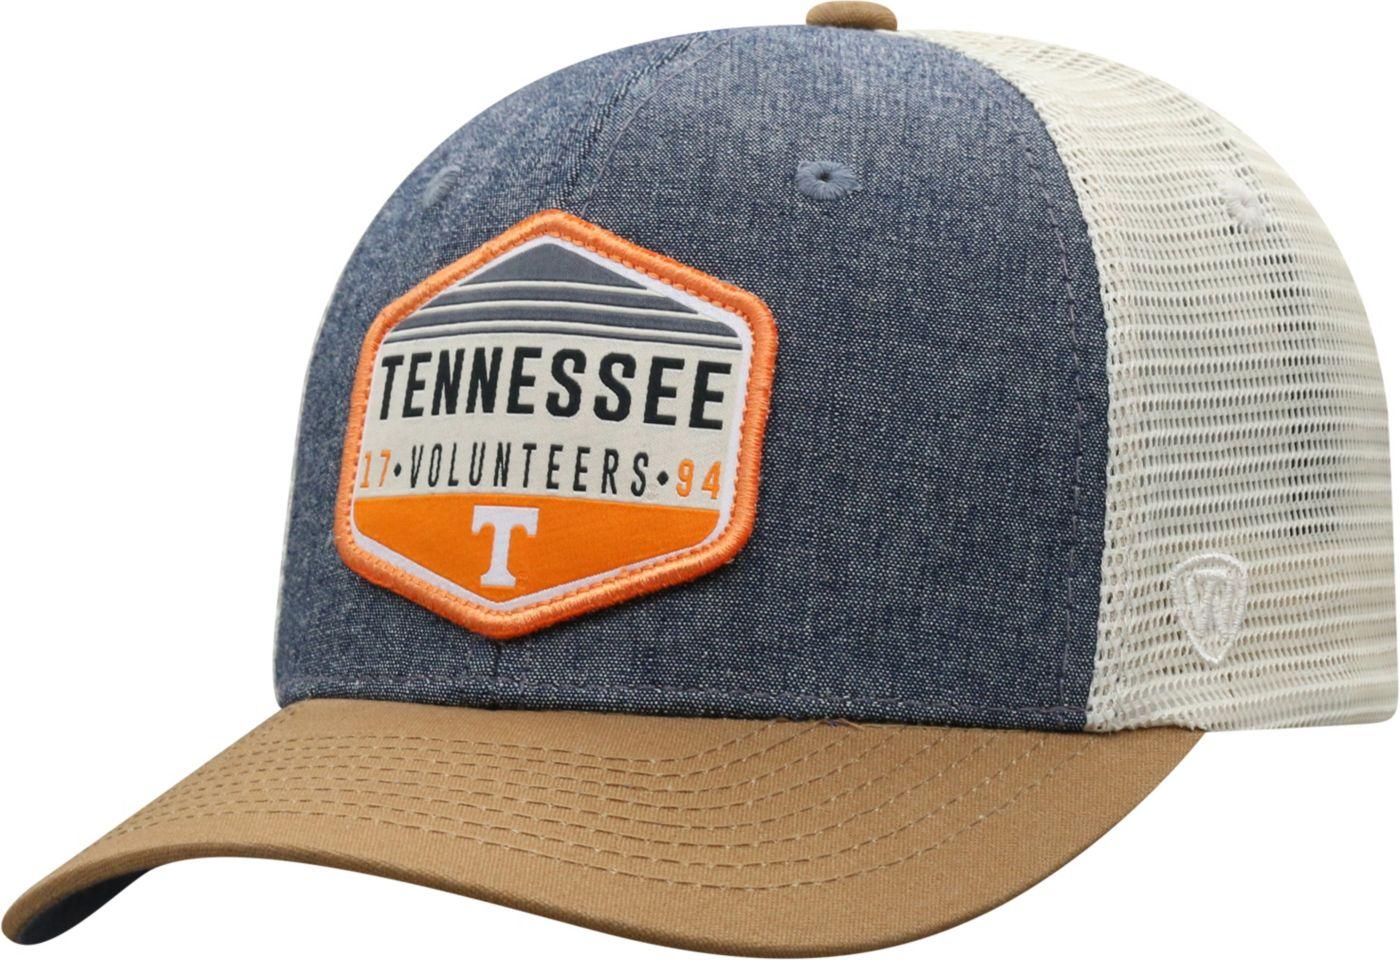 Top of the World Men's Tennessee Volunteers Grey/Brown/White Wild Adjustable Hat